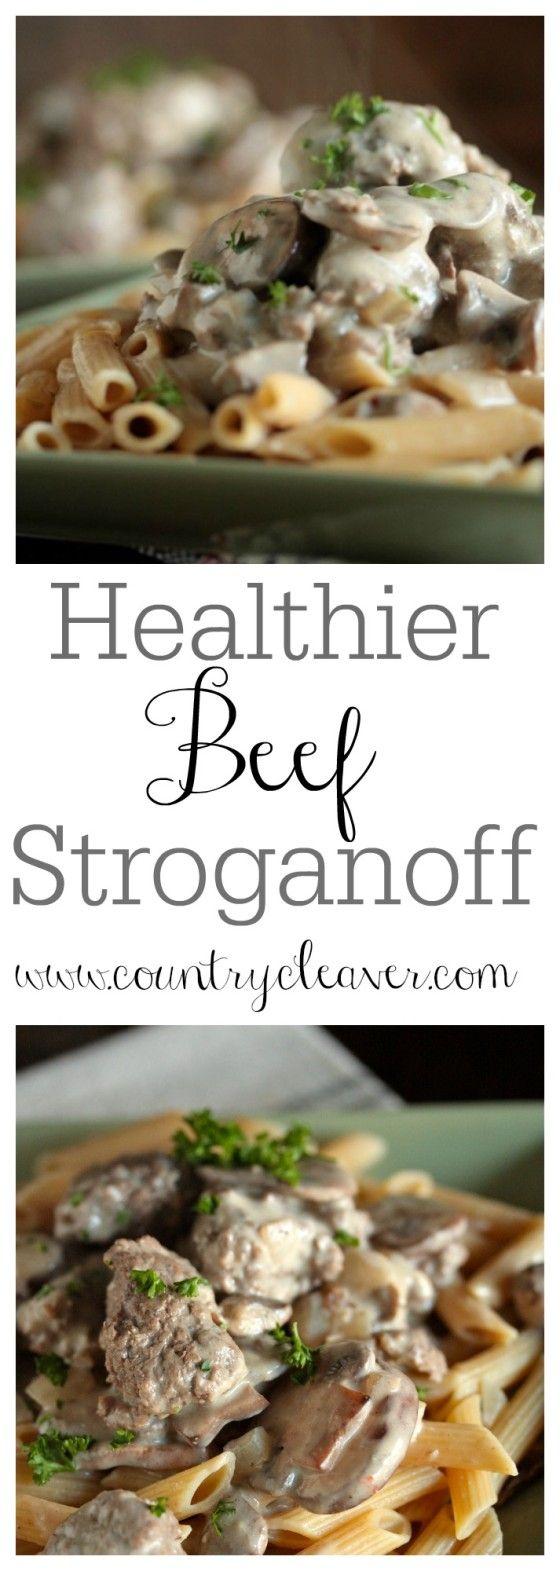 Healthier Beef Stroganoff